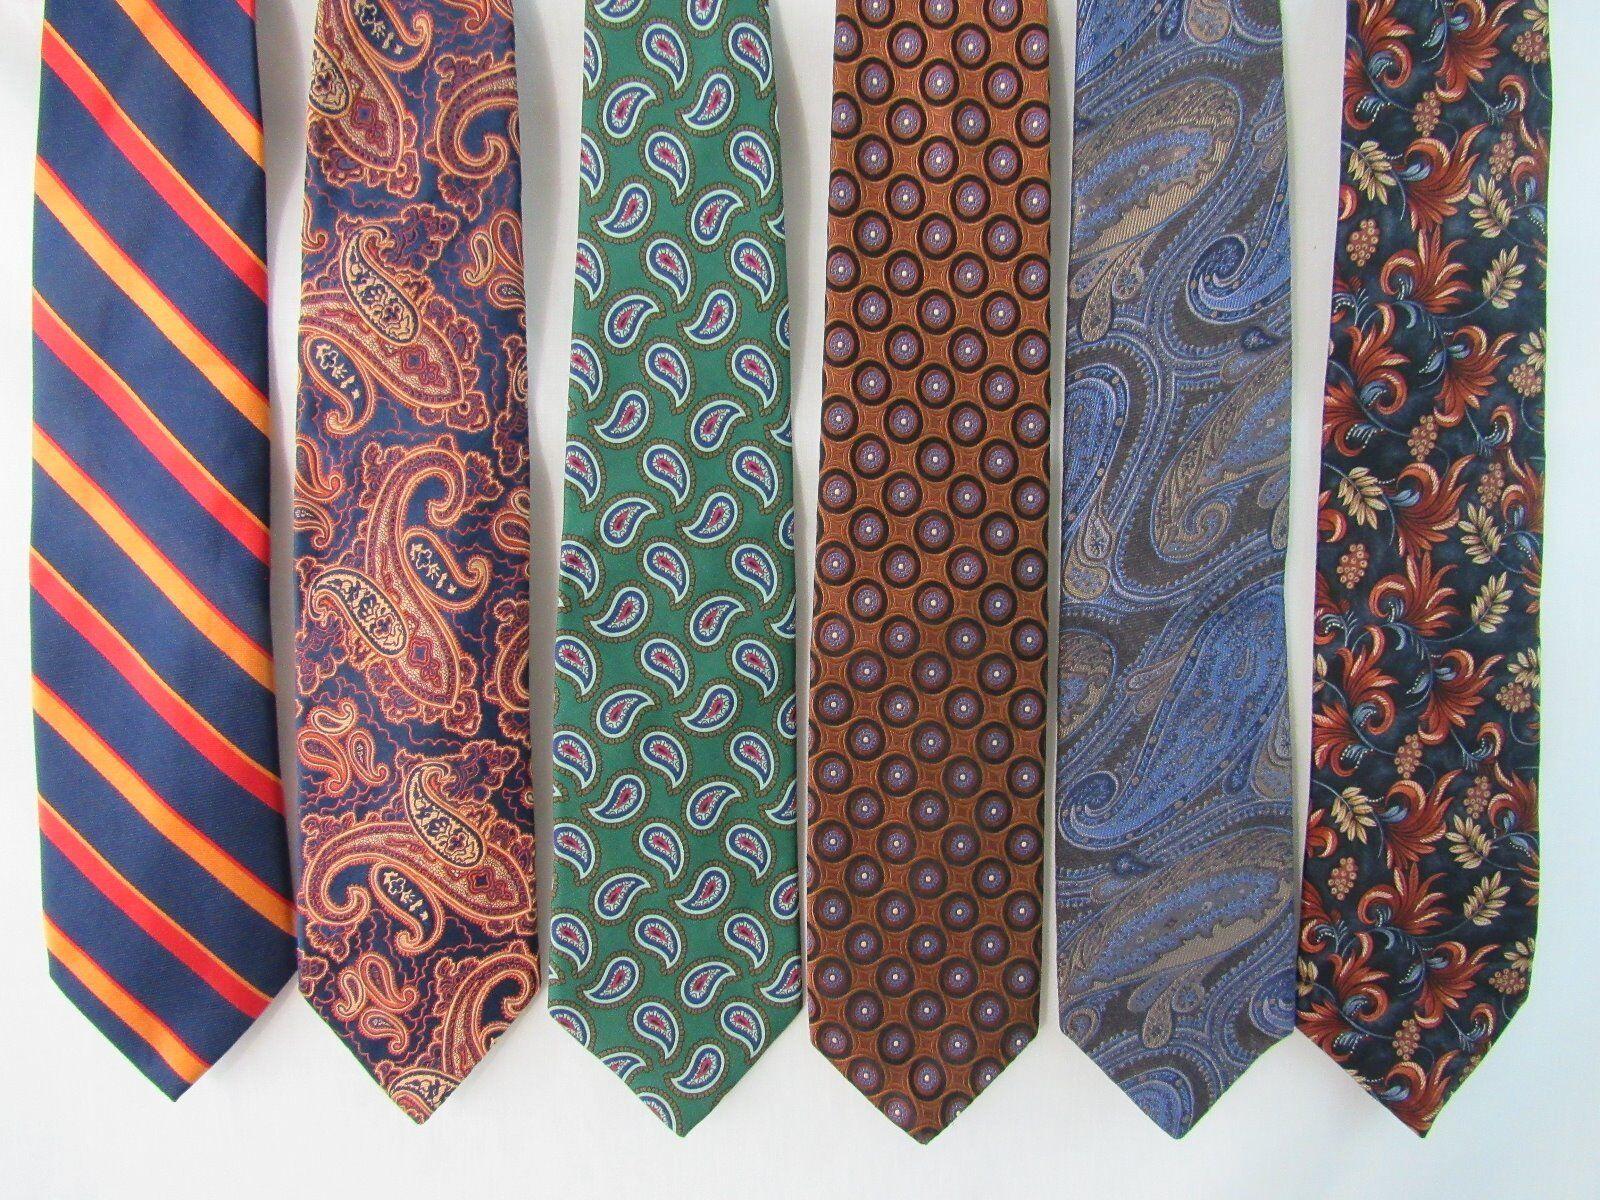 Lot of 6 Neckties Robert Talbott, XMI, Countess Mara, Brooks Brothers, Chaps